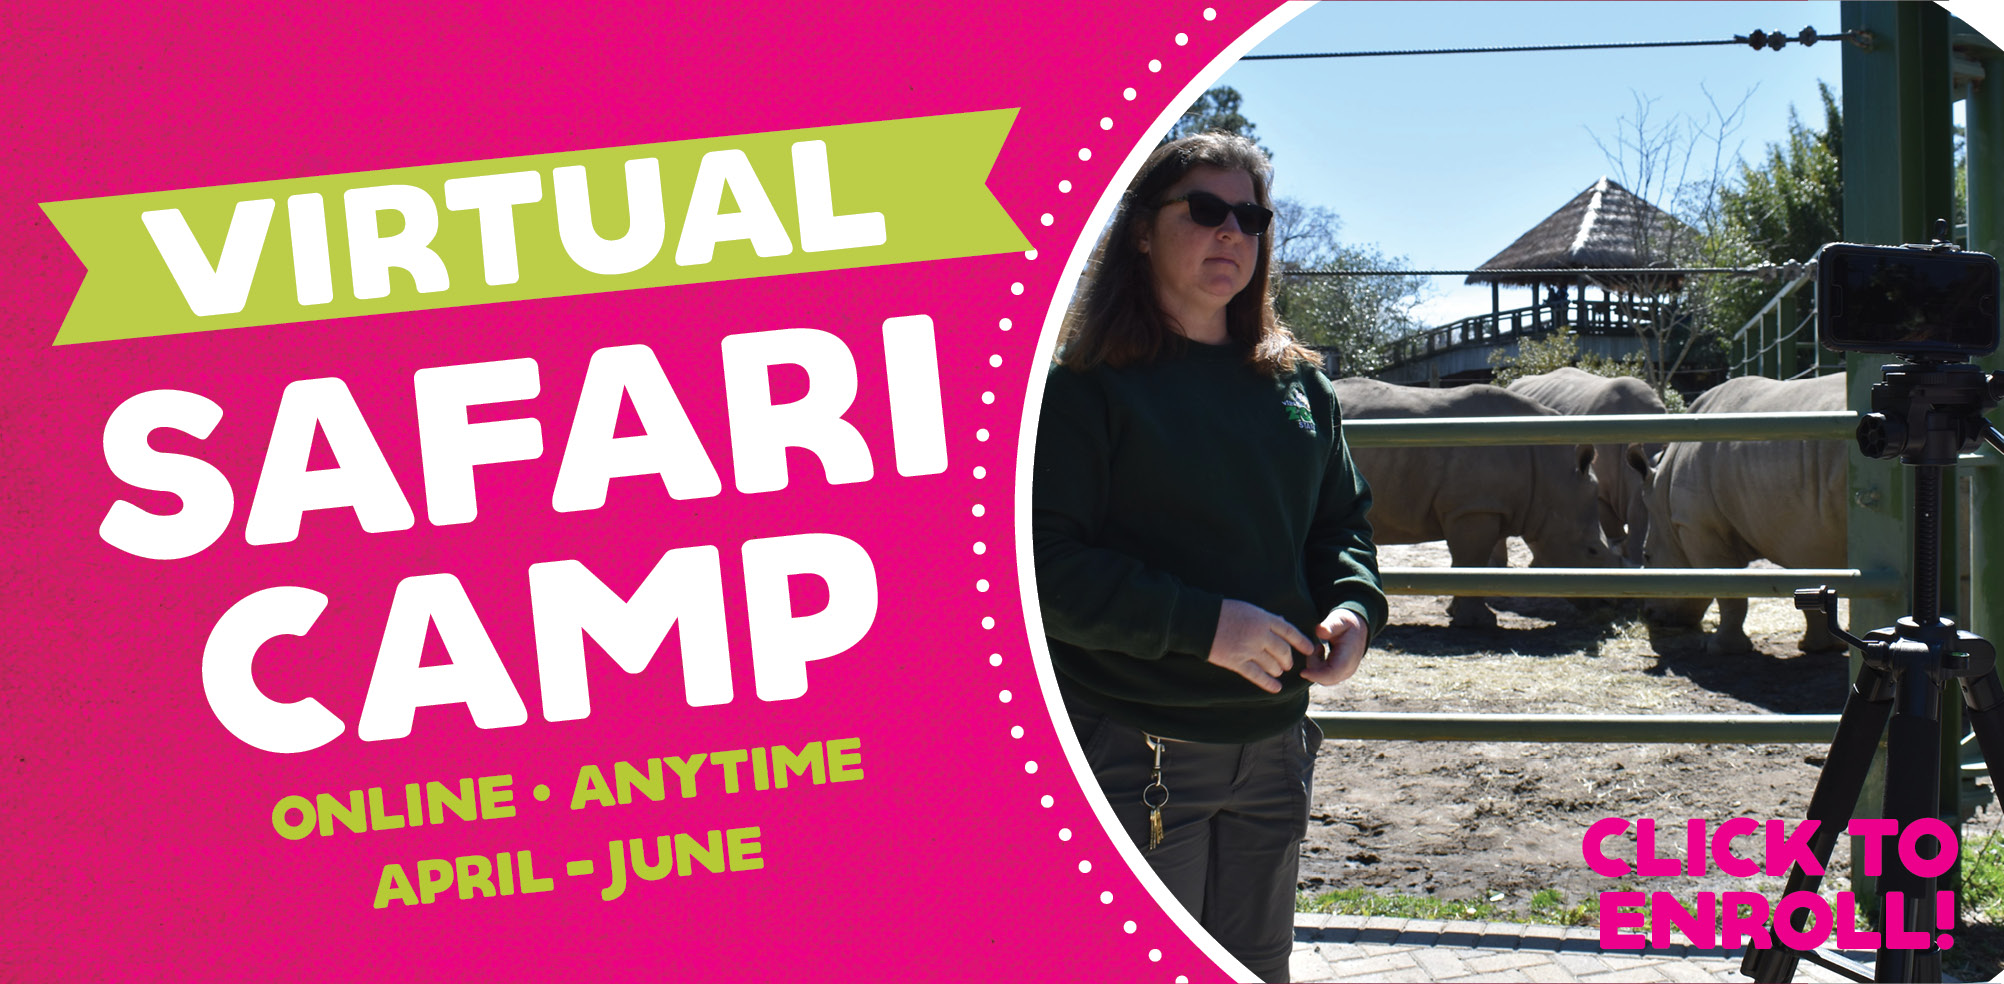 VAZOO_Virtual Spring Camp online_slider